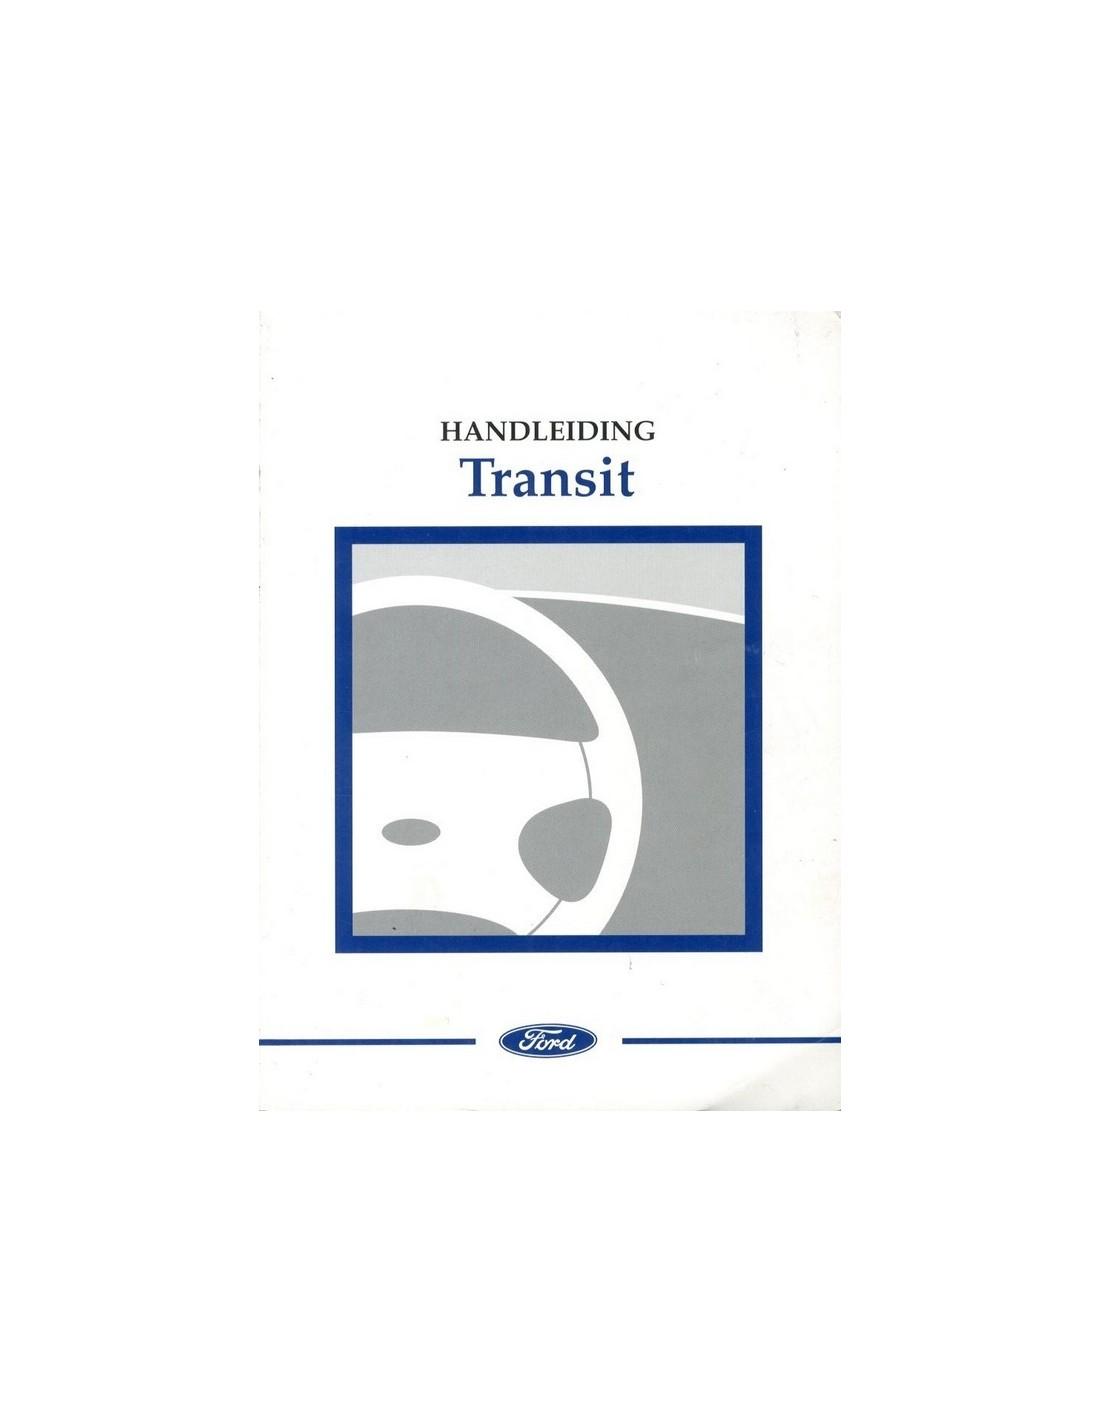 2002 ford transit owner s manual handbook dutch rh autolit eu